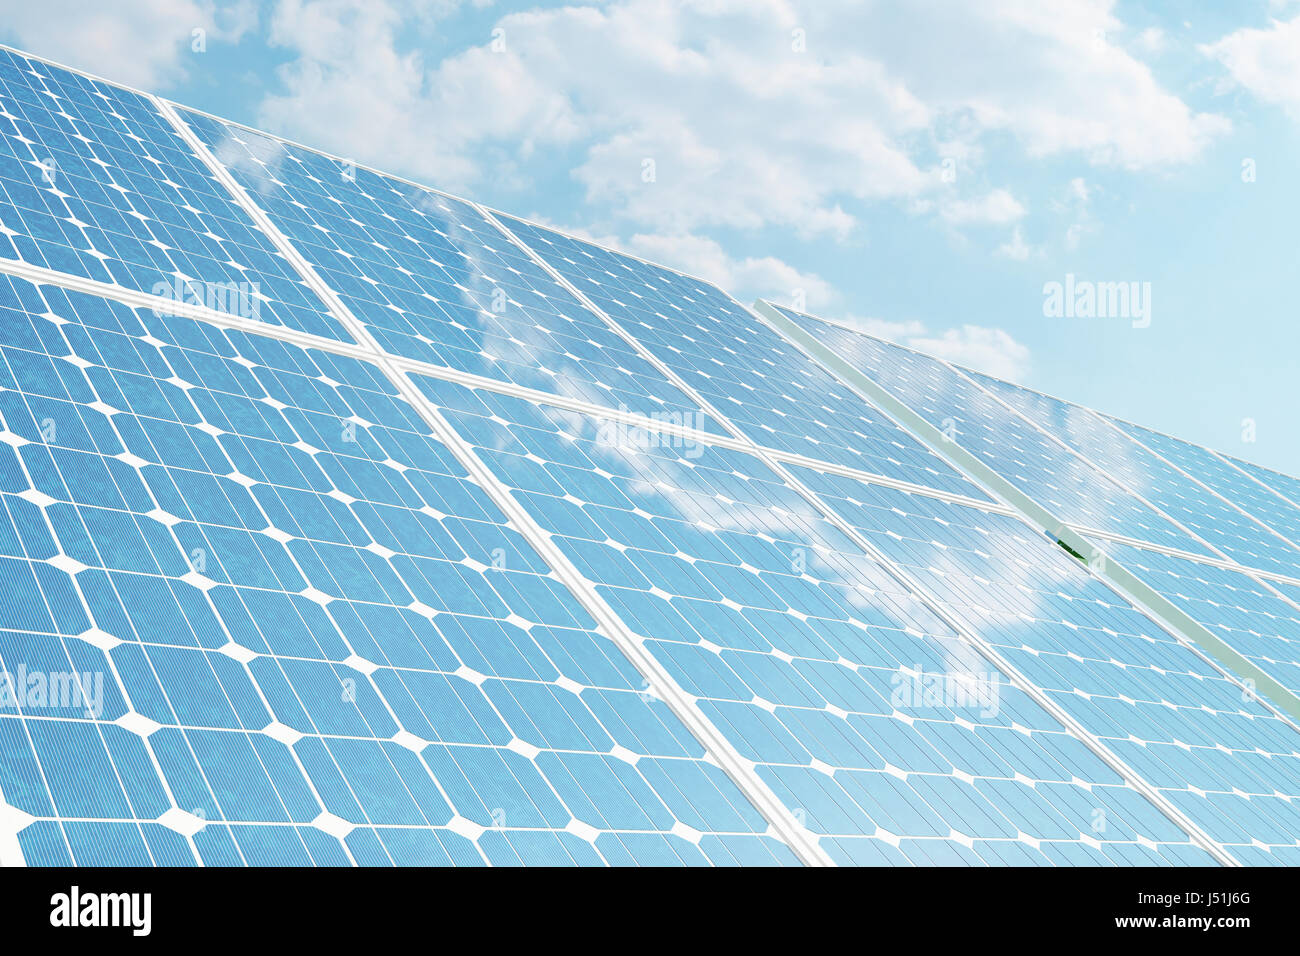 solar panel background - photo #10